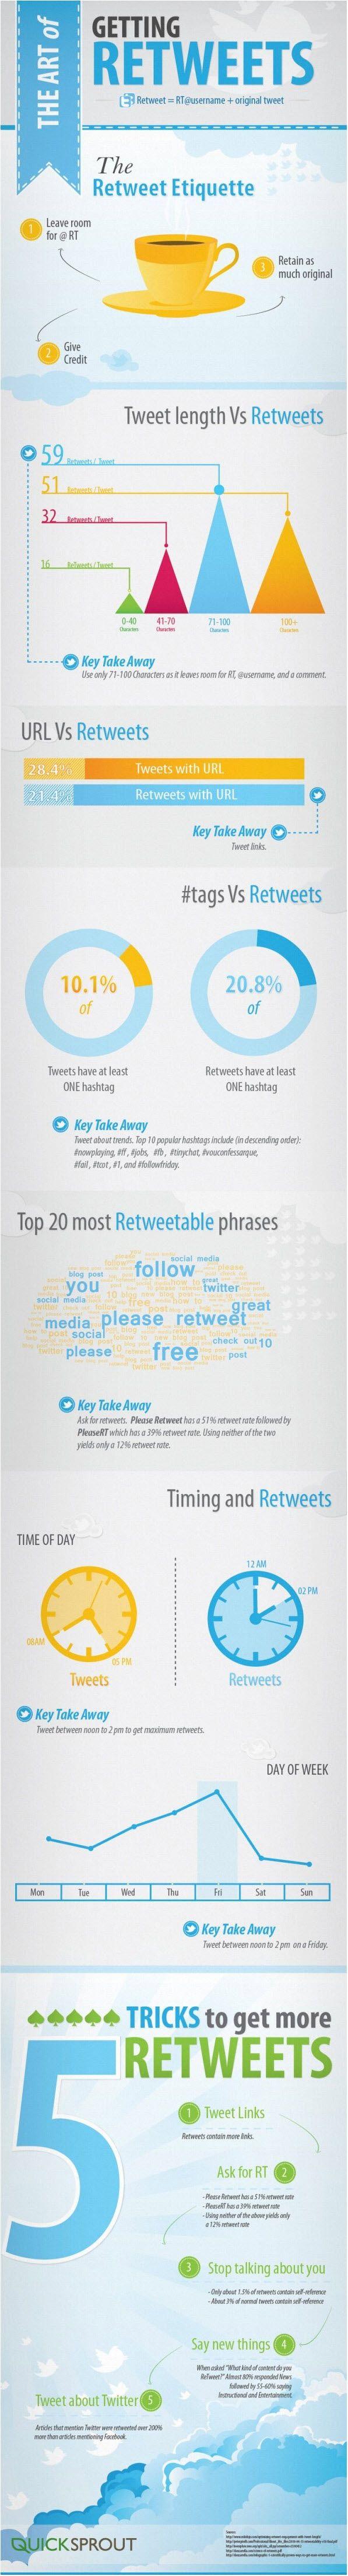 How to Get More #Retweets on Twitter - Jeffbullas's Blog via Vicente de Vicq